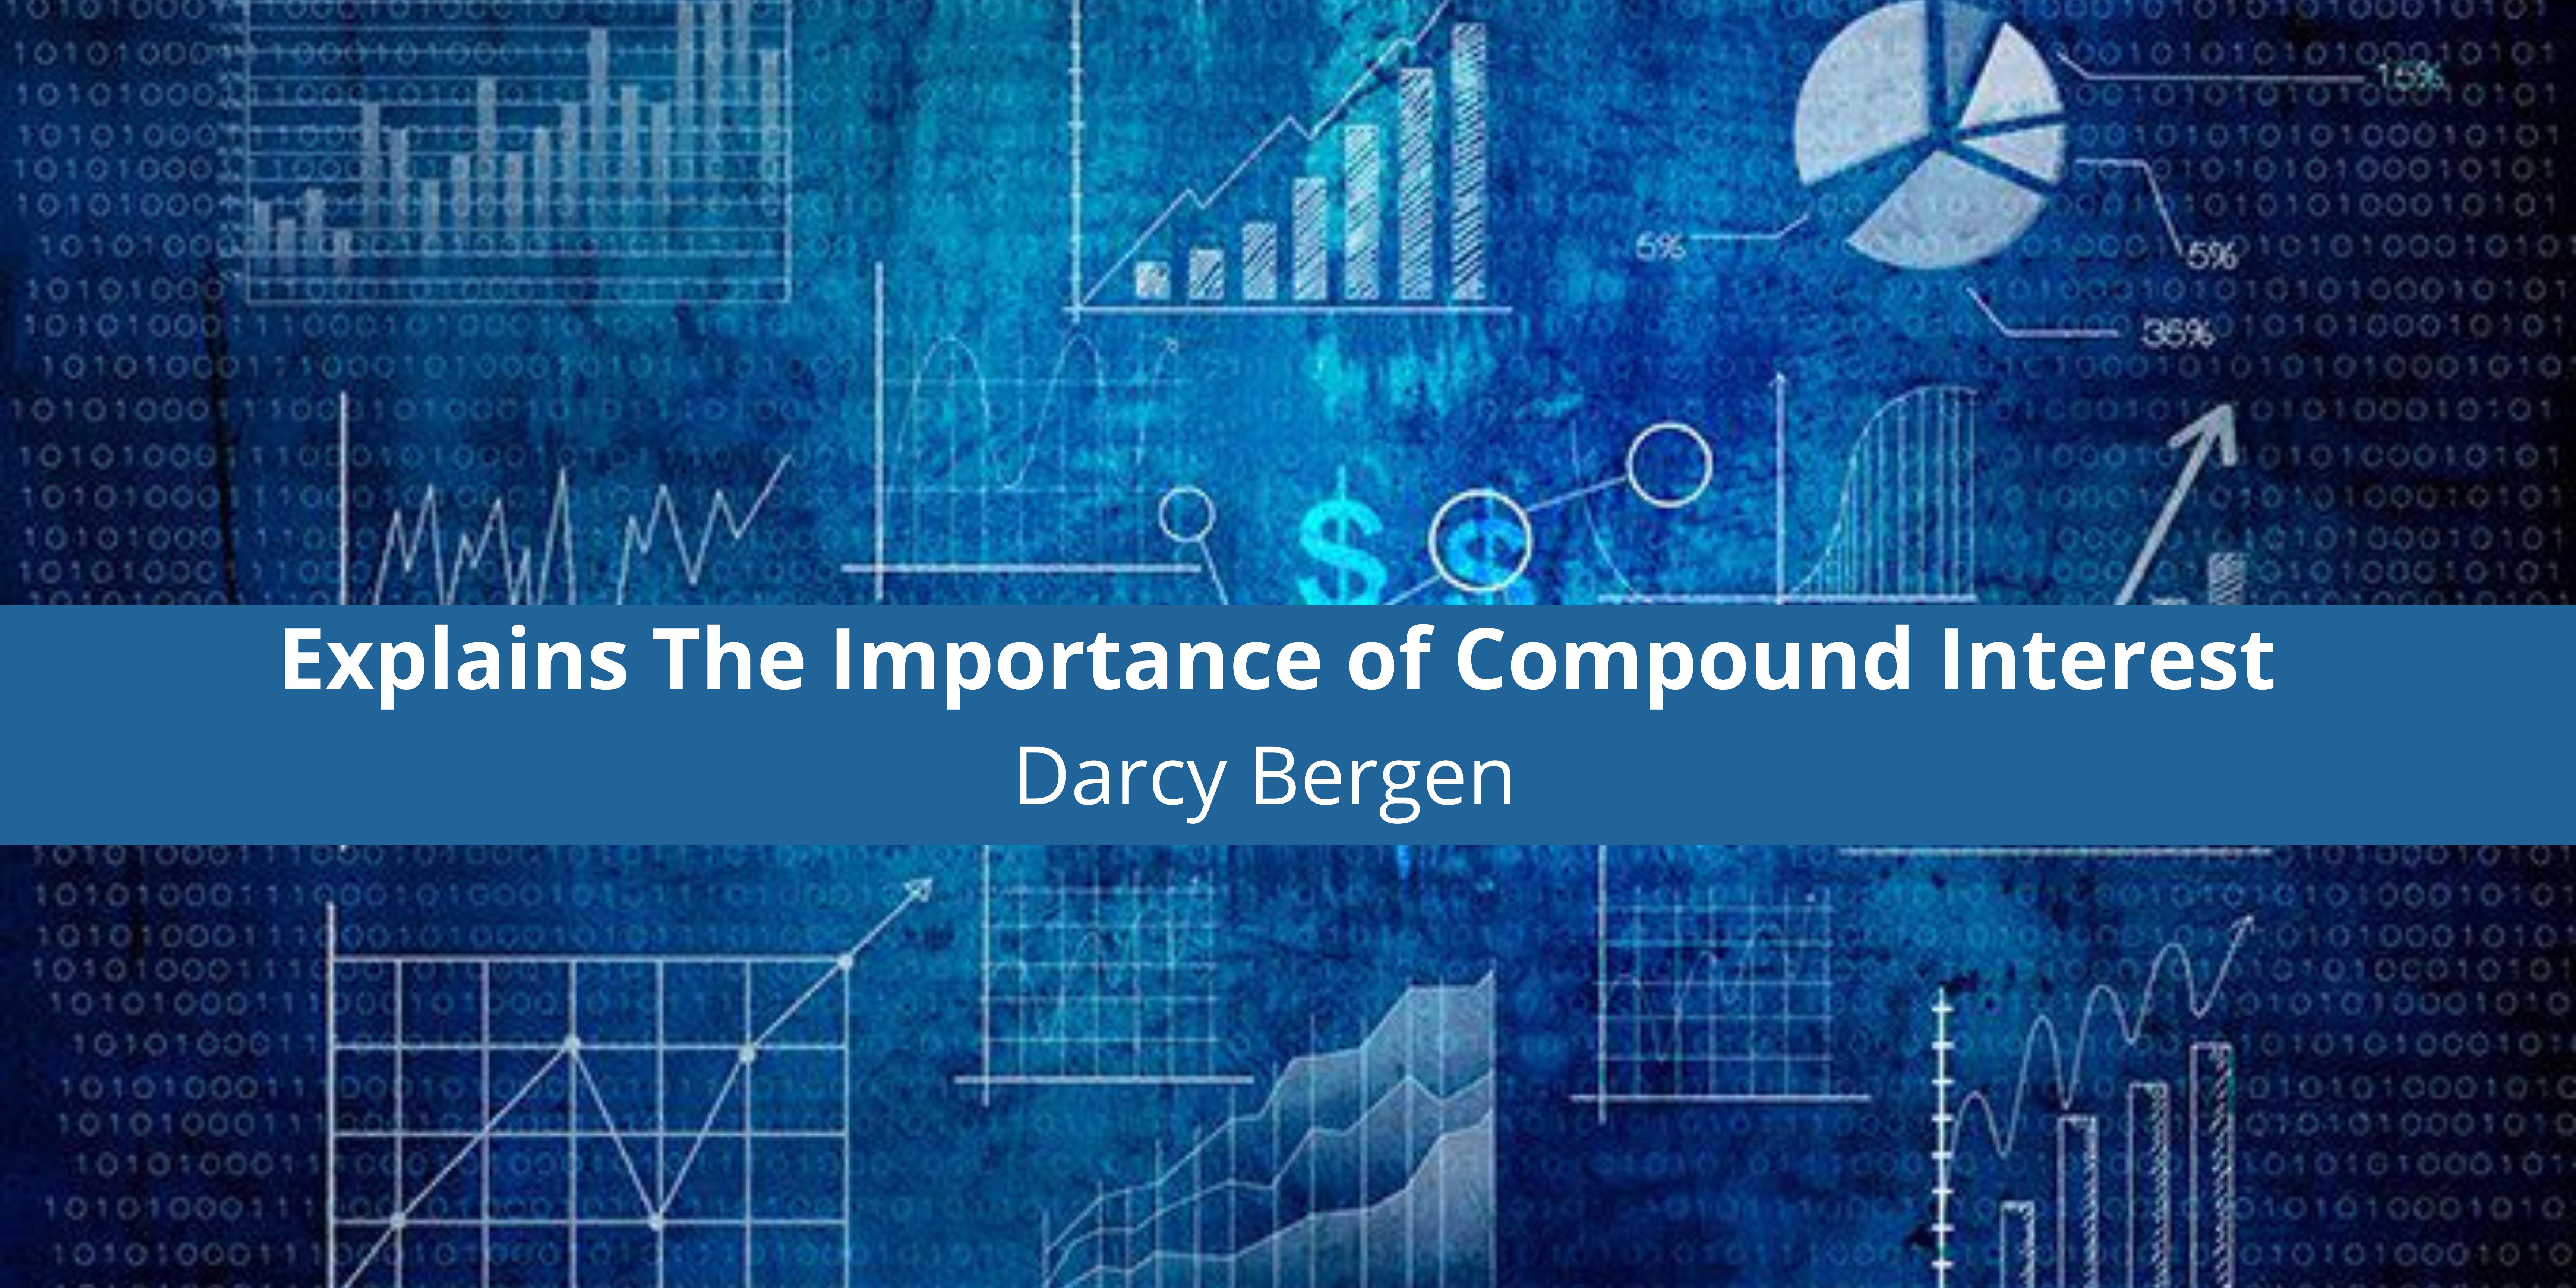 Darcy Bergen Explains The Importance of Compound Interest